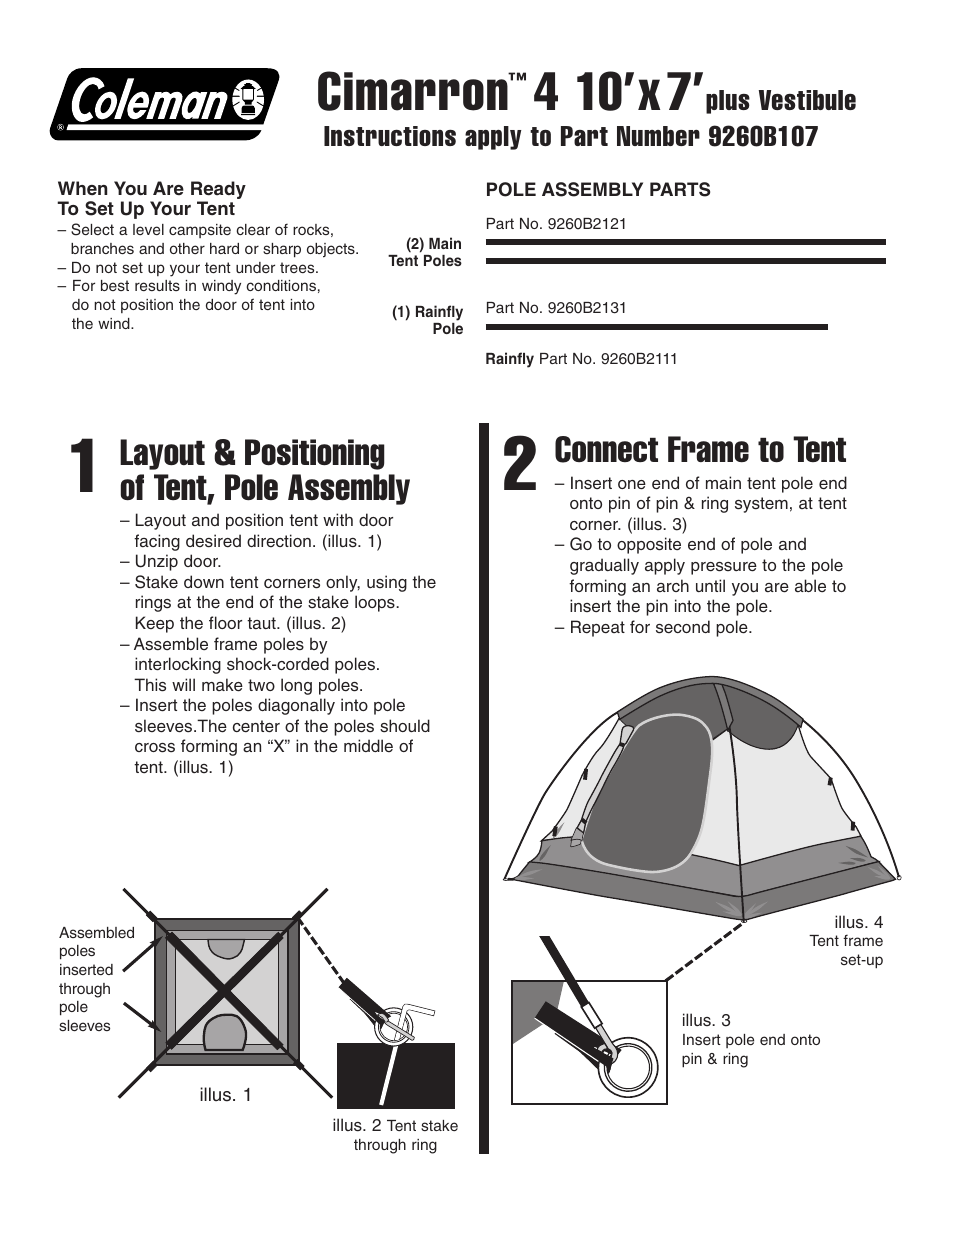 sc 1 st  manualsdir.com & Coleman Cimarron 4 10u0027x7u0027 User Manual | 2 pages